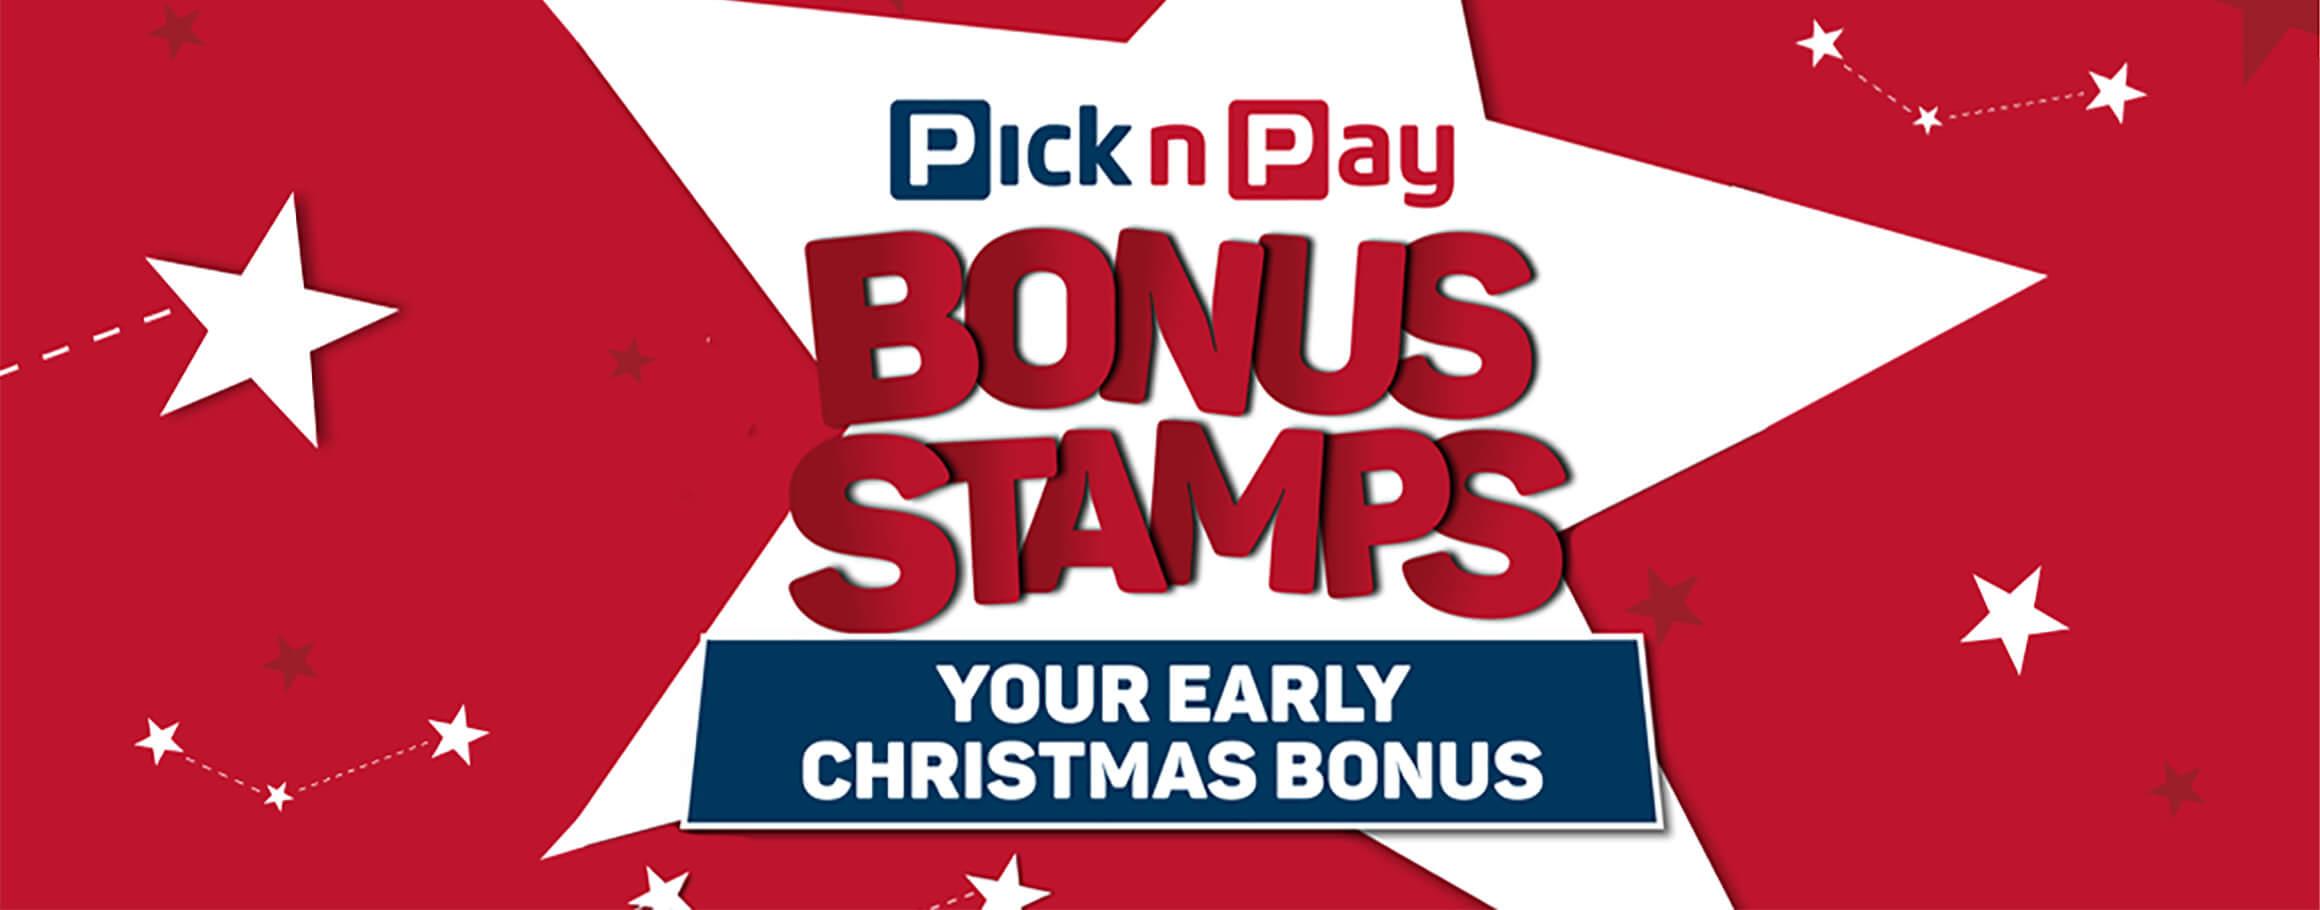 Pick n Pay Bonus Stamps   Your early Christmas Bonus